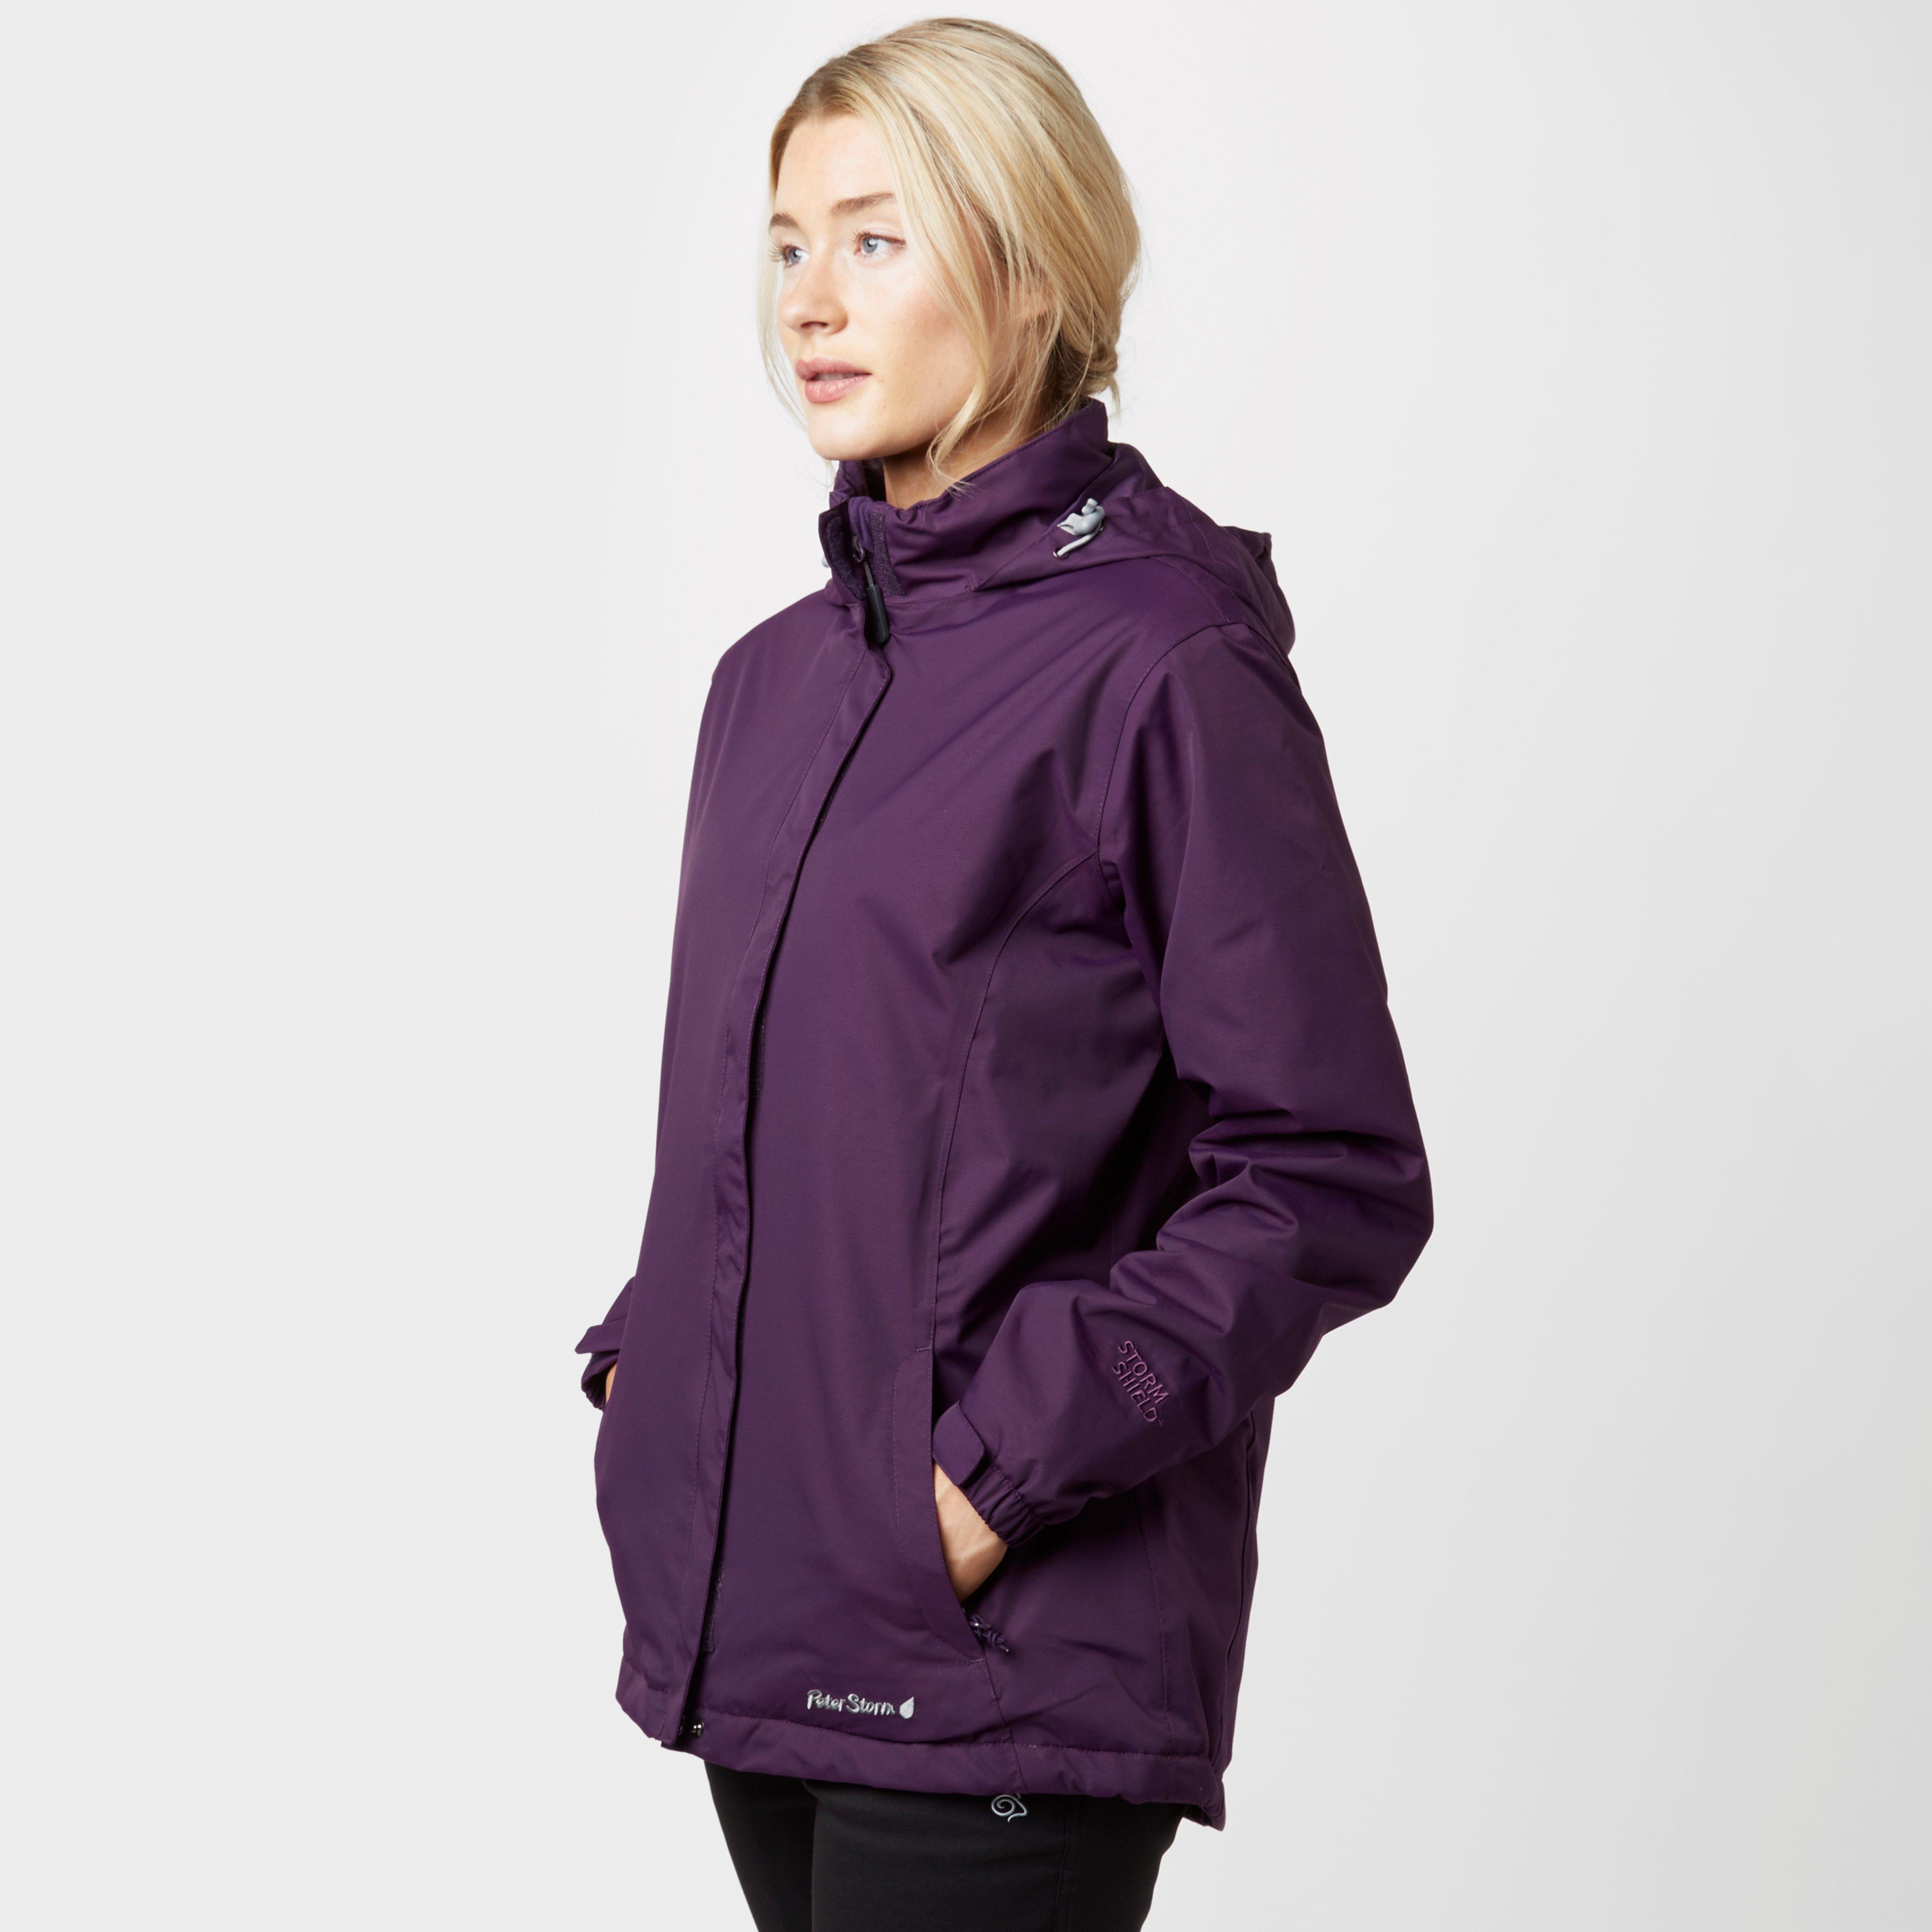 Peter Storm Women's Insulated Storm Jacket